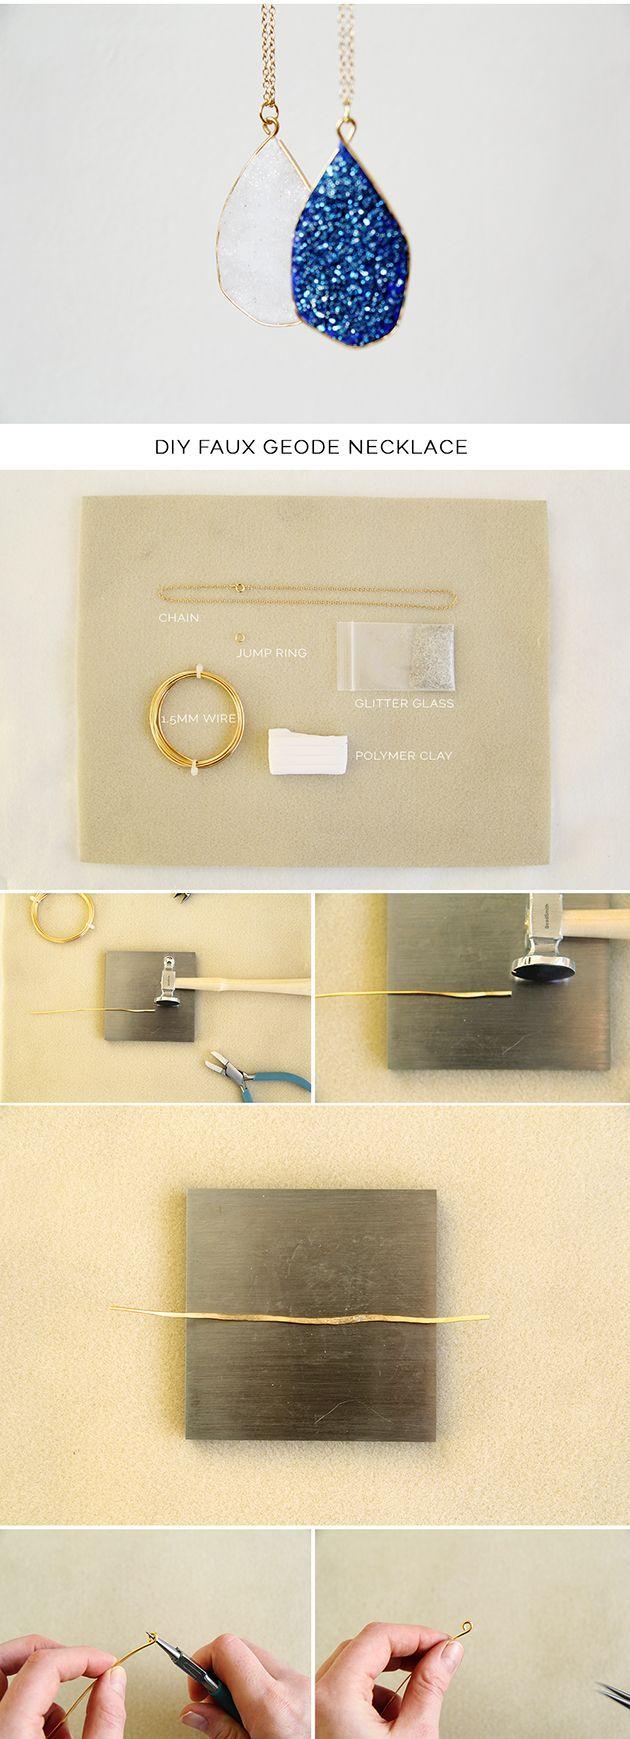 DIY Faux geode necklace